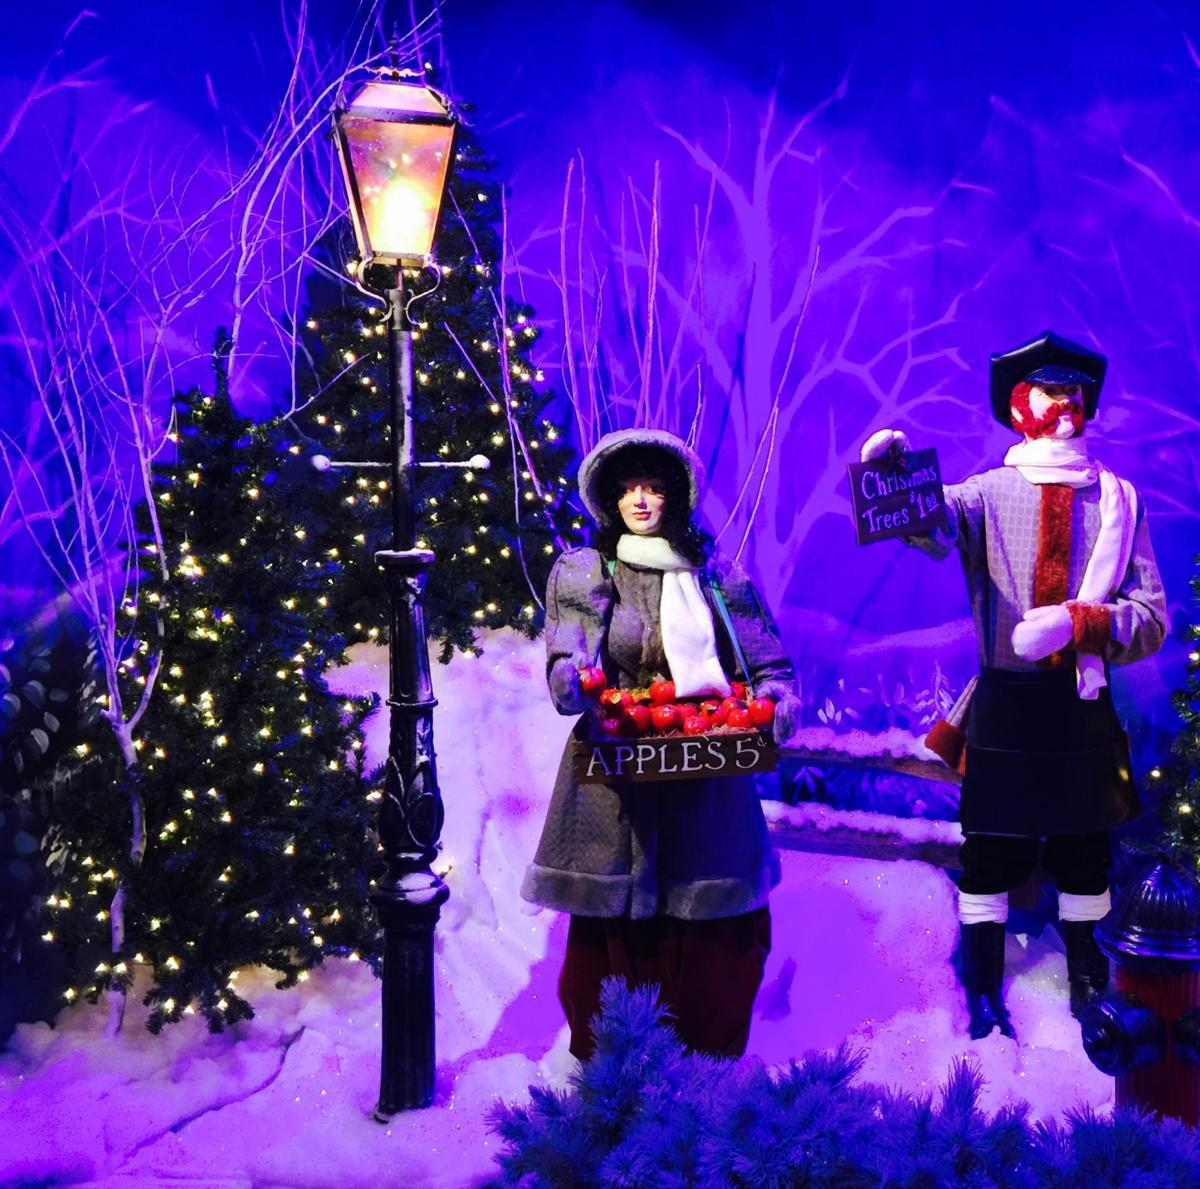 Christmas Land.Kringle S Christmas Land Set To Open At Promenade Mall On